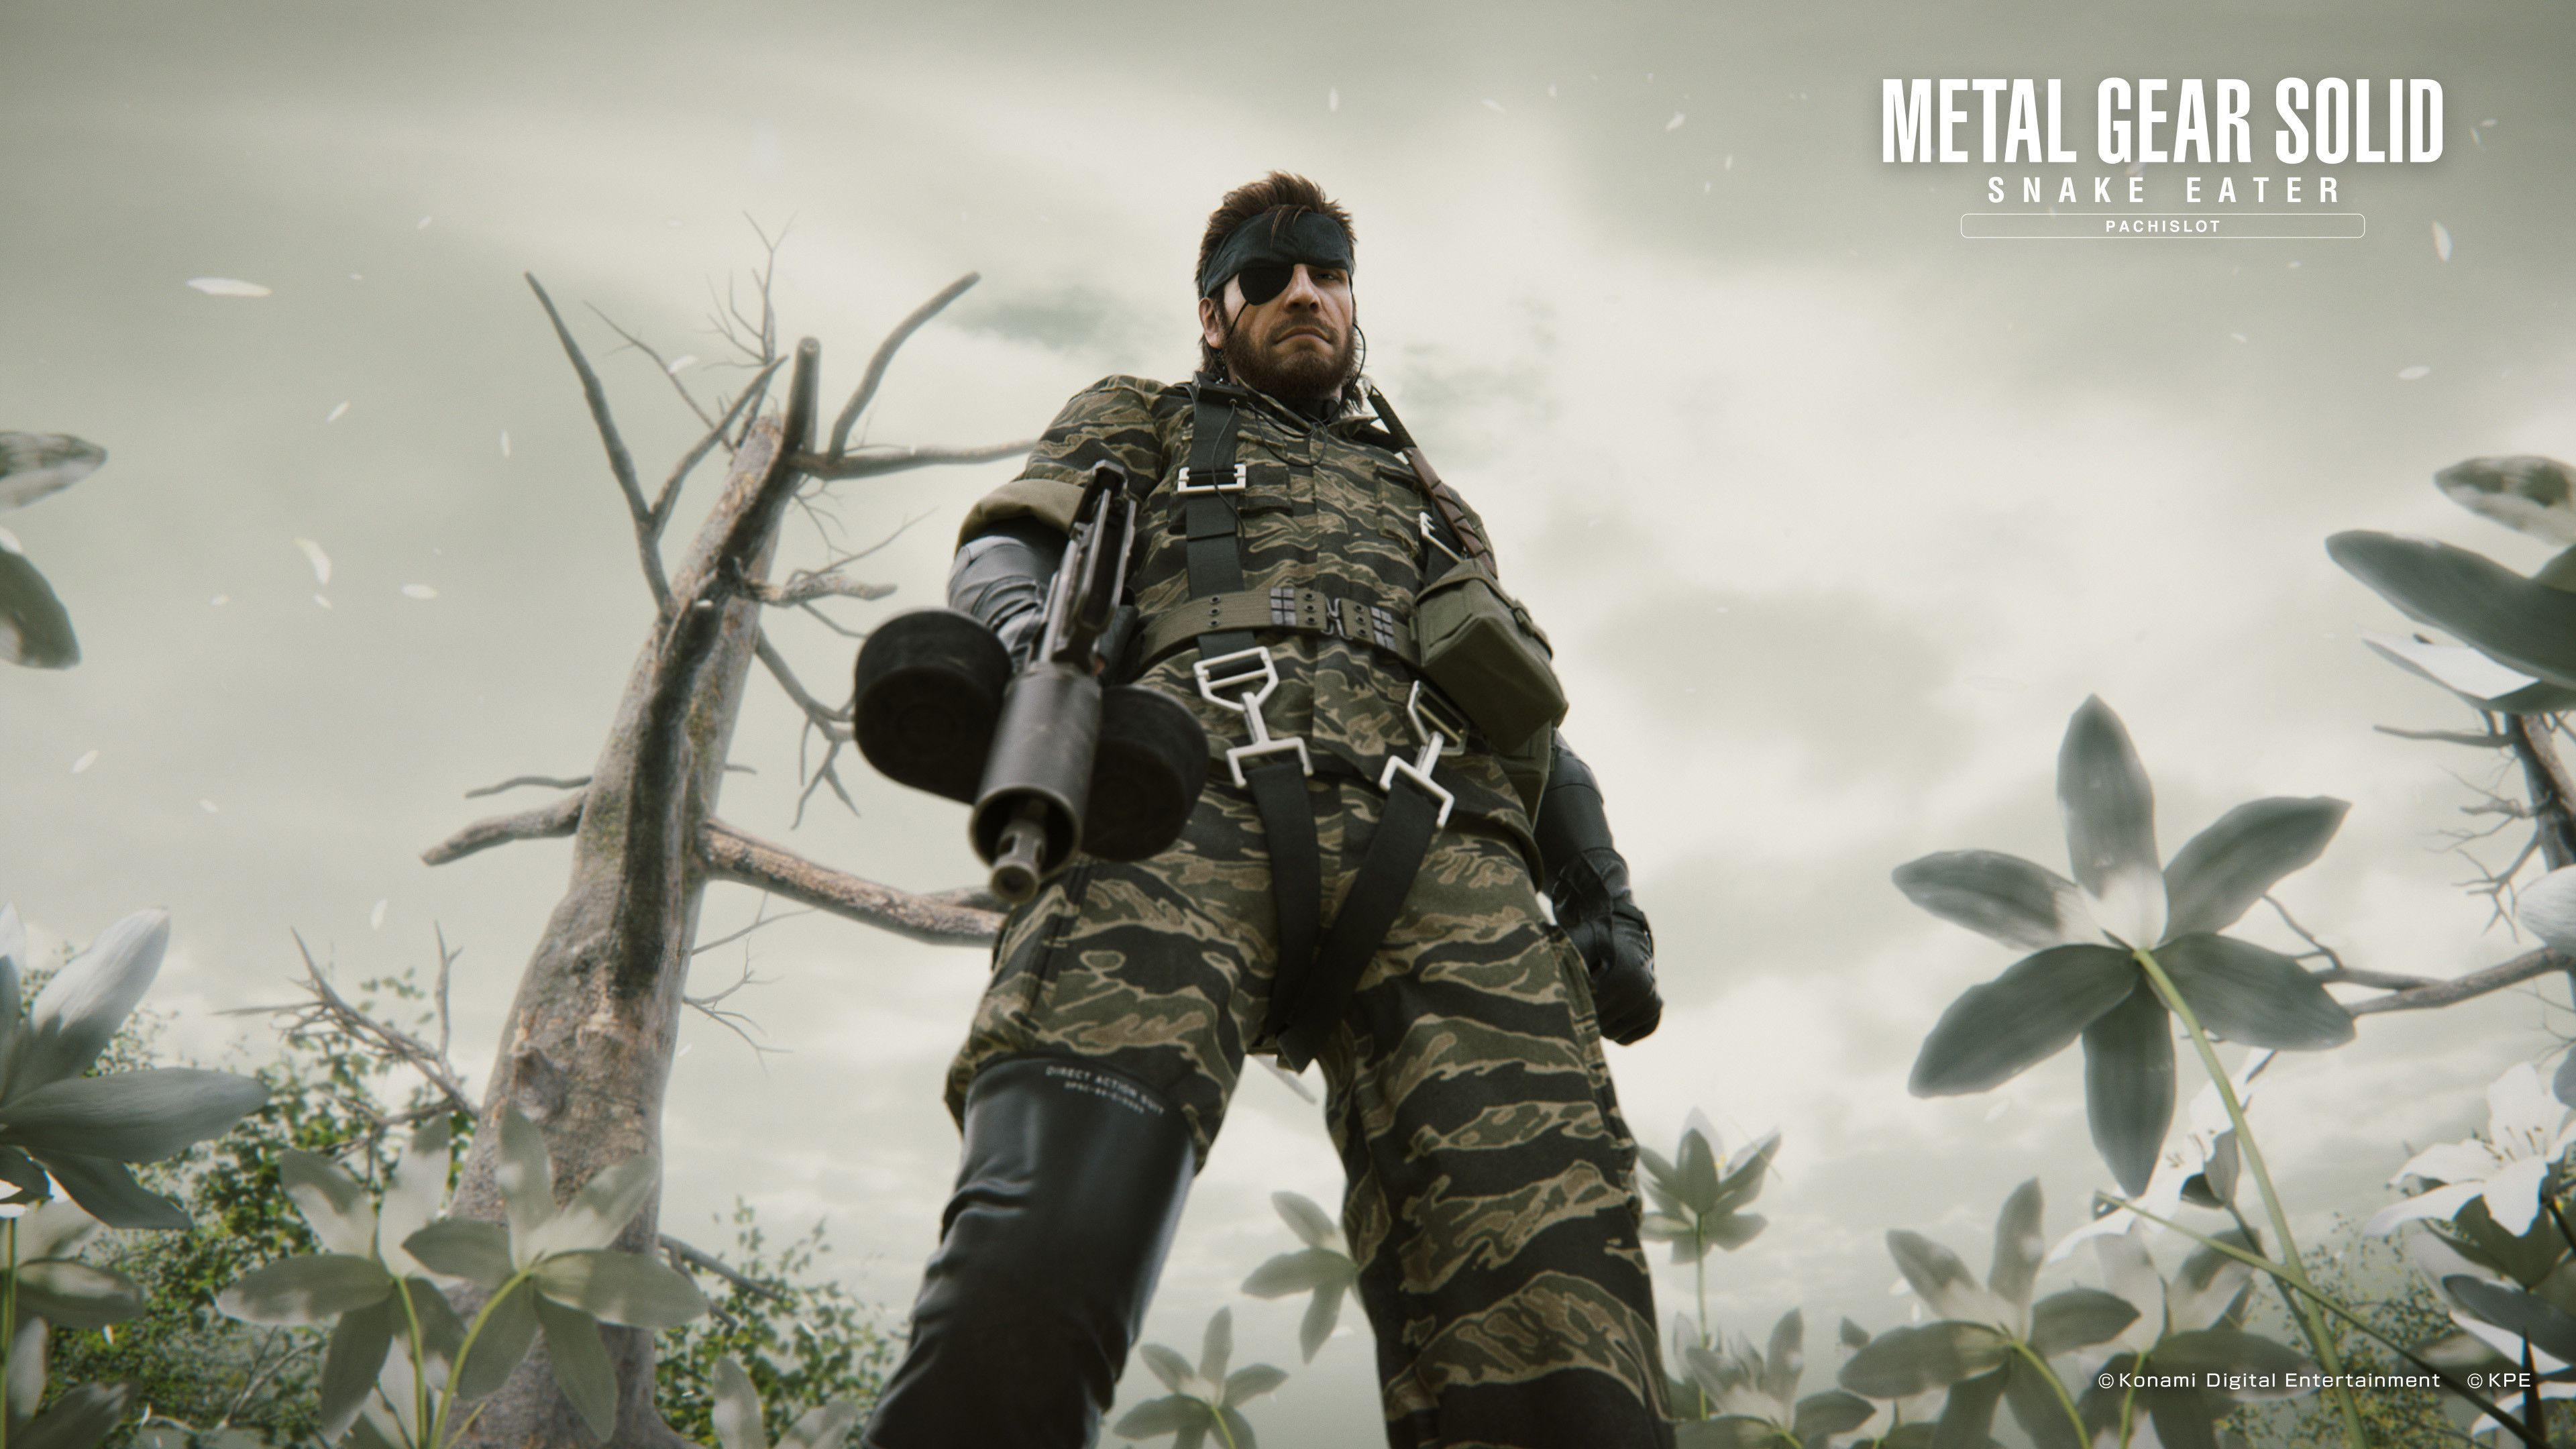 Big Boss Mgs Wallpapers Big Boss Metal Gear